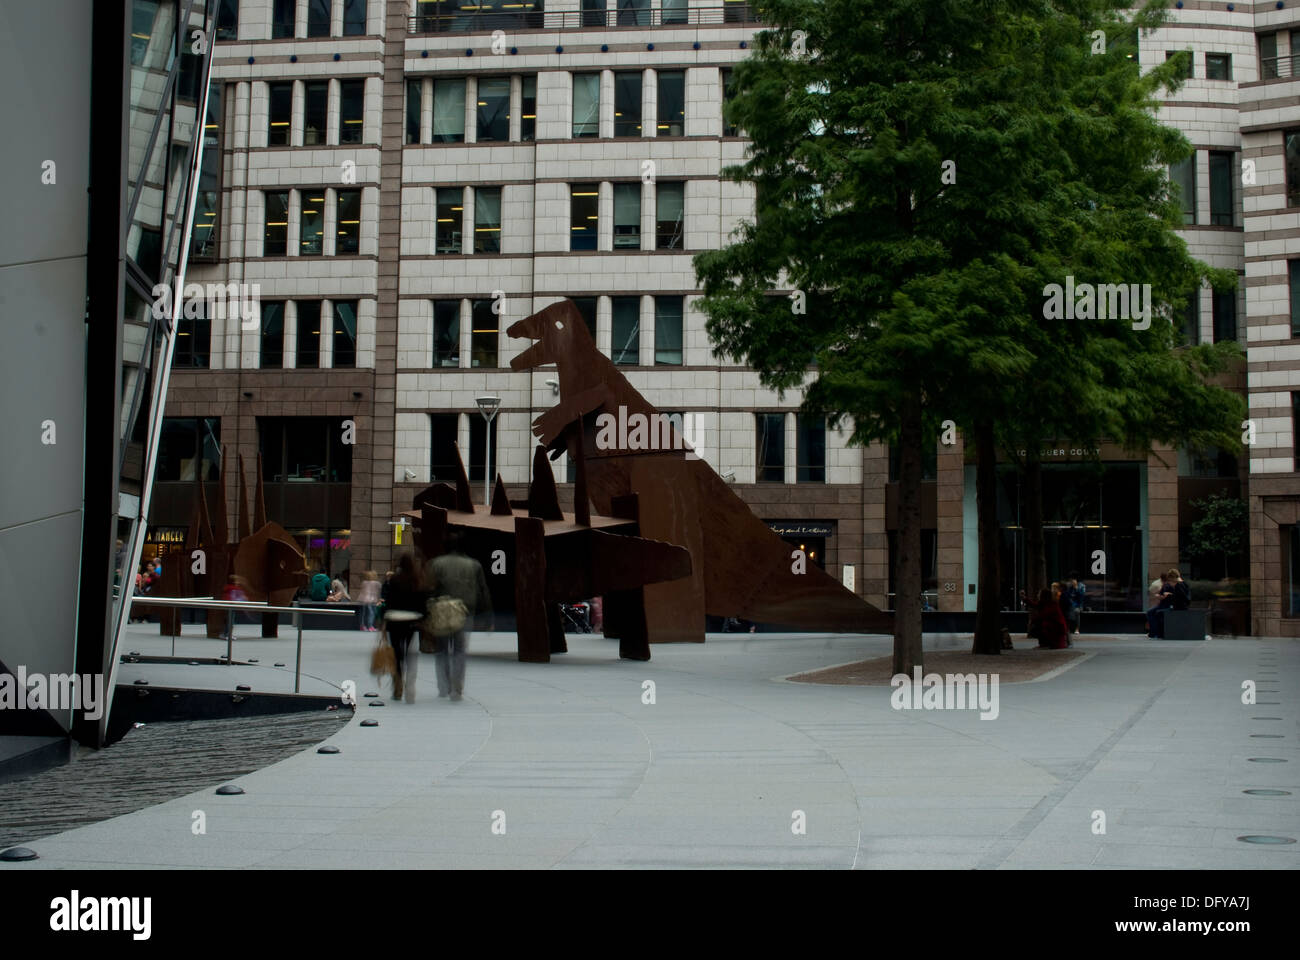 St Marys Axe London EC3 Stock Photo